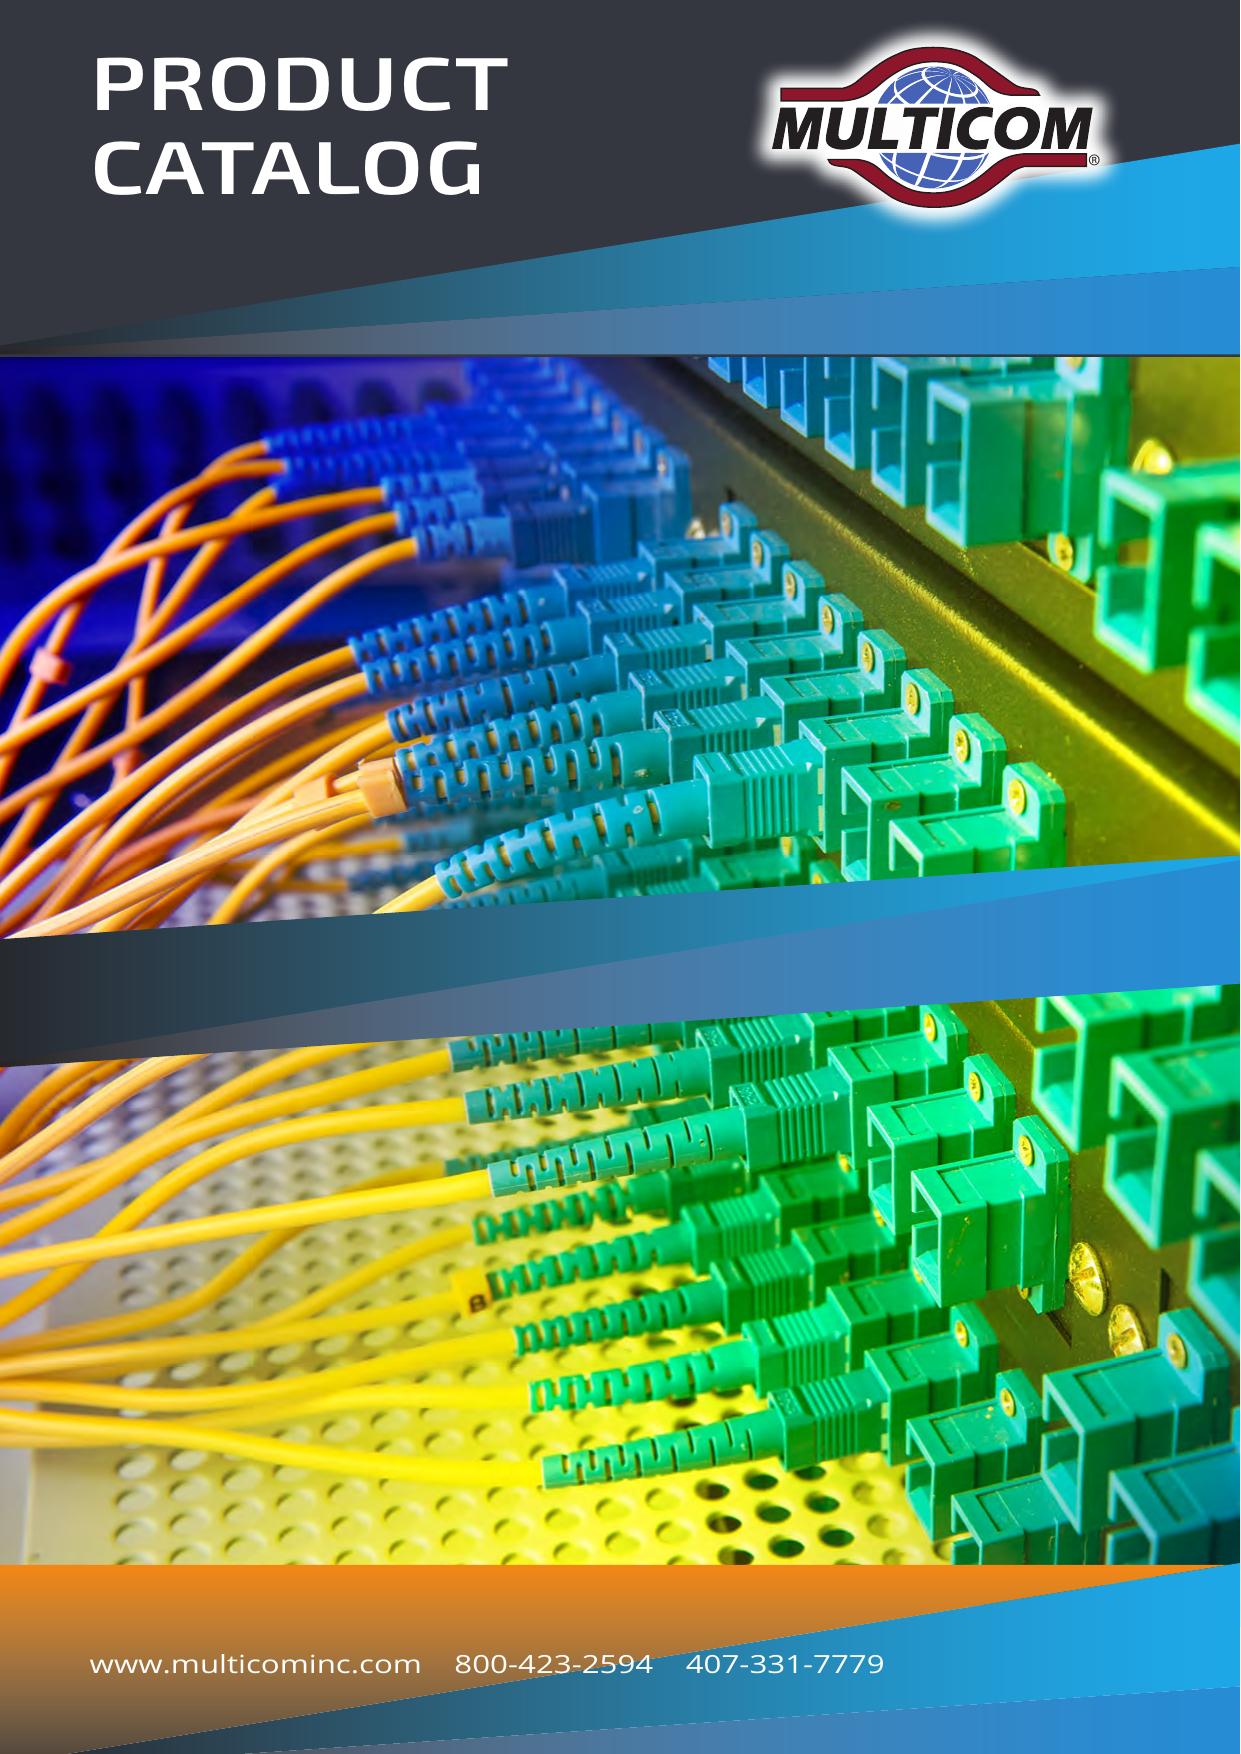 60//40 split Harmonic SC//APC  1x2 Fiber Optic Splitter Module 1310//1550nm